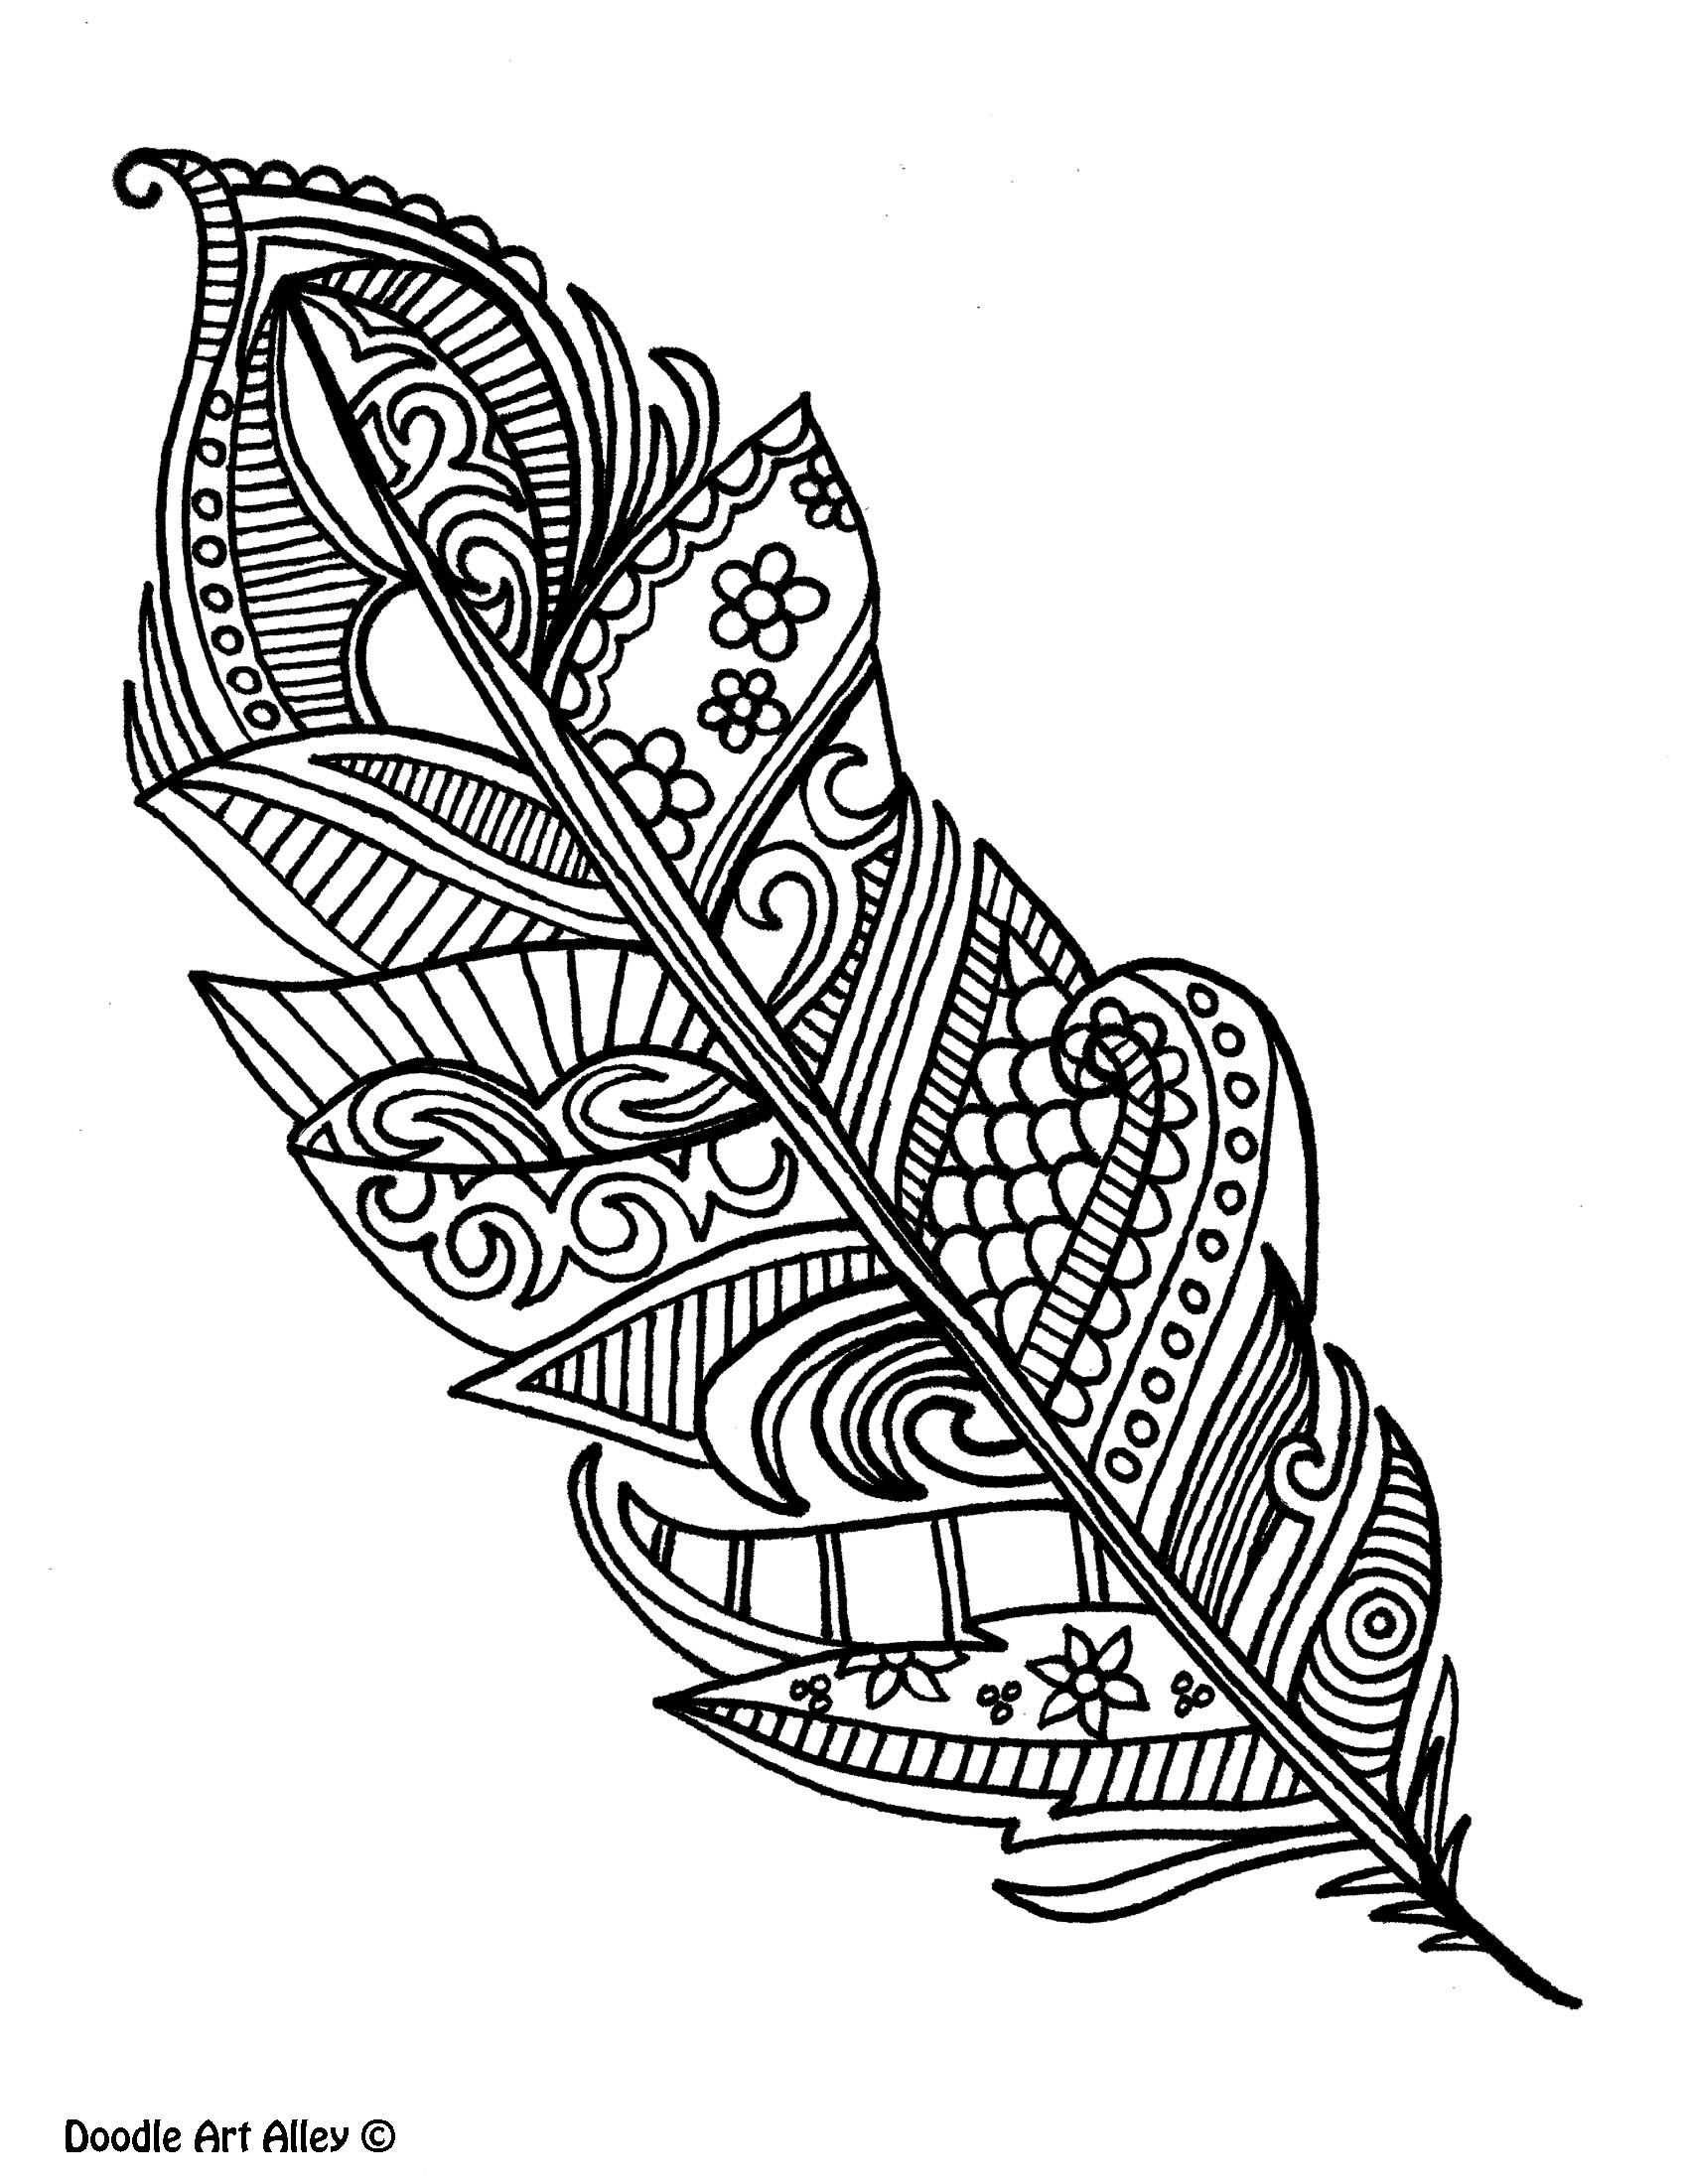 Feather | ART: PennInk, doddling & Zetangles | Pinterest